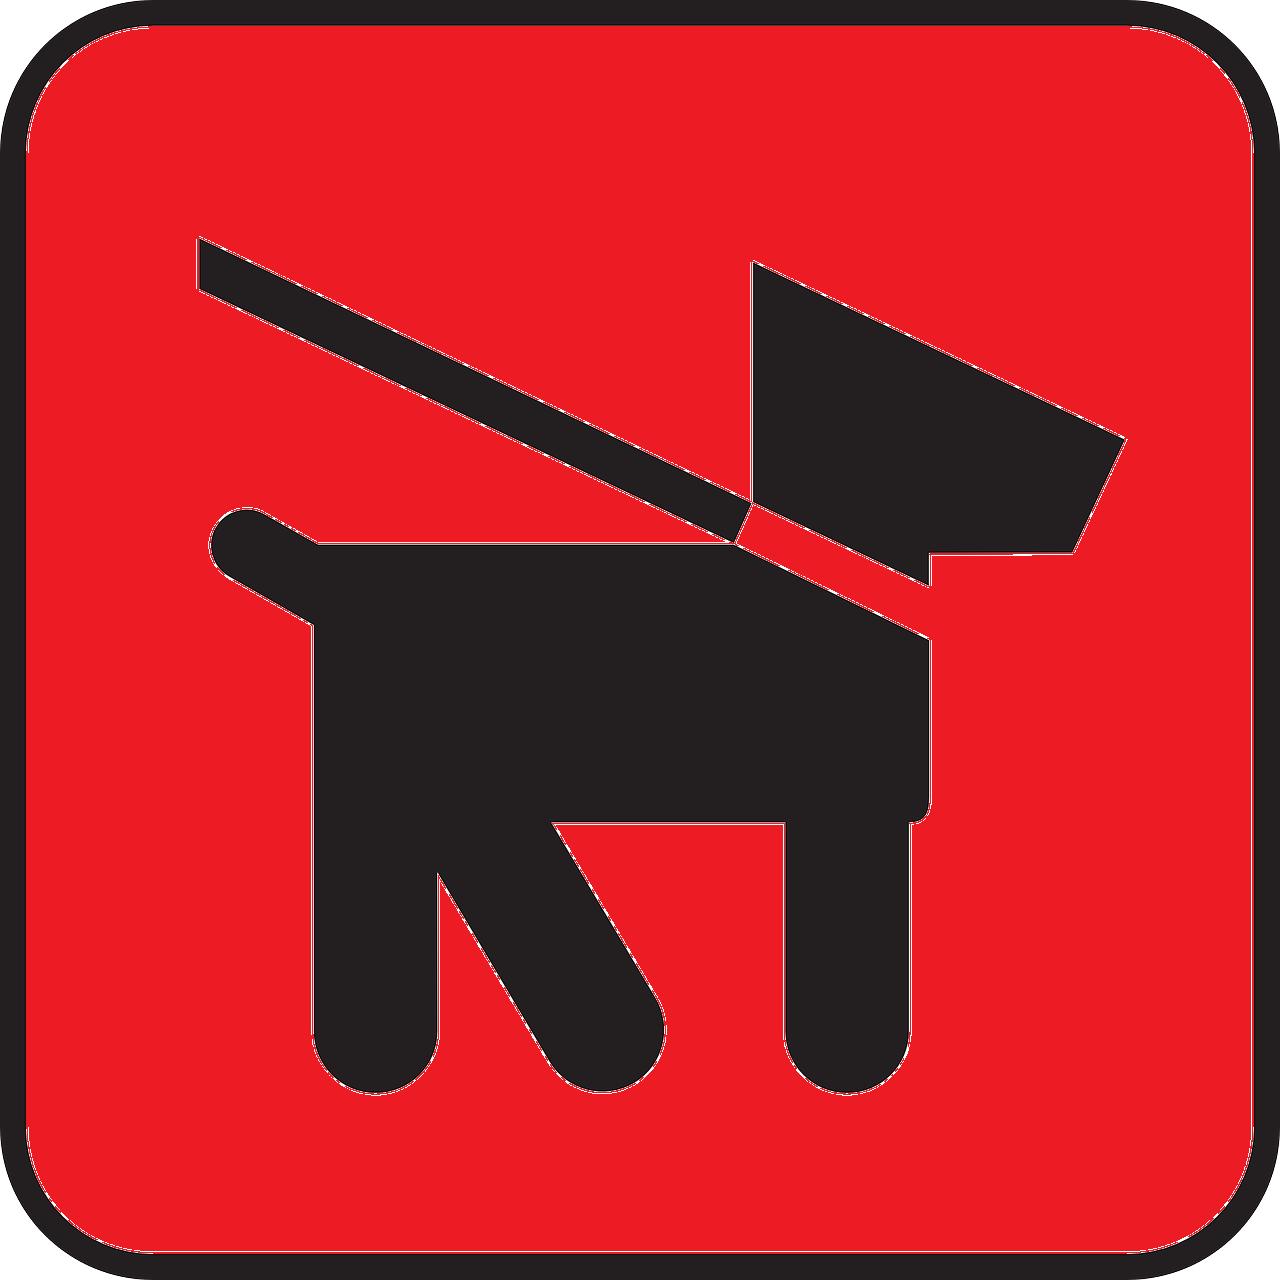 dog-99213_1280.png